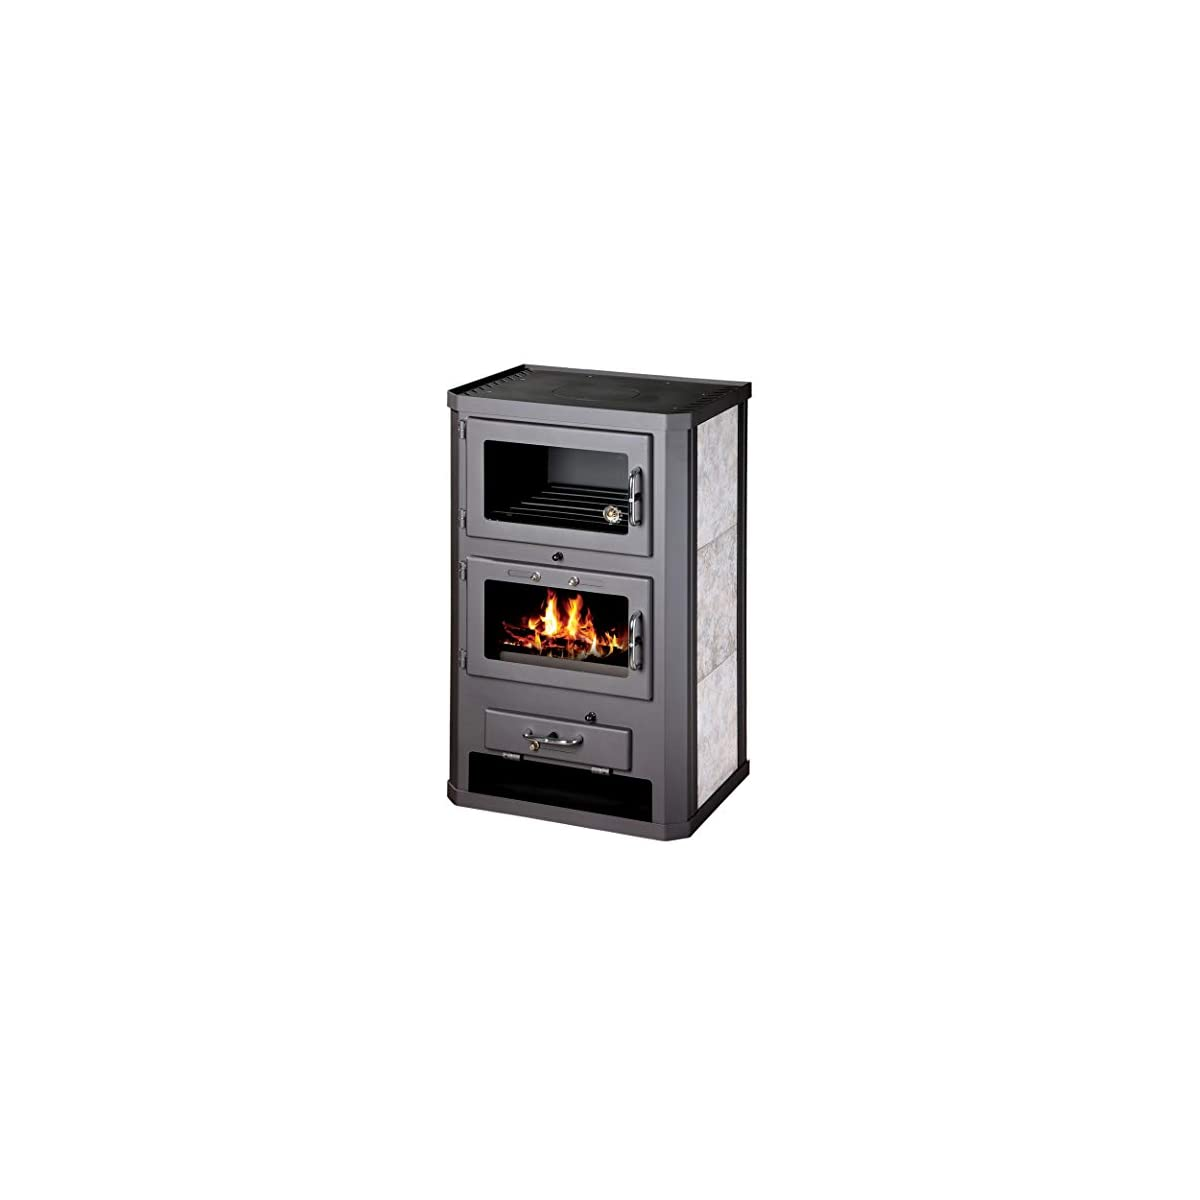 41LNczLiCOL. SS1200  - Estufa de leña para estufa, estufa, cocina, combustible, quemador de leña, 12/17 kW, BImSchV 2